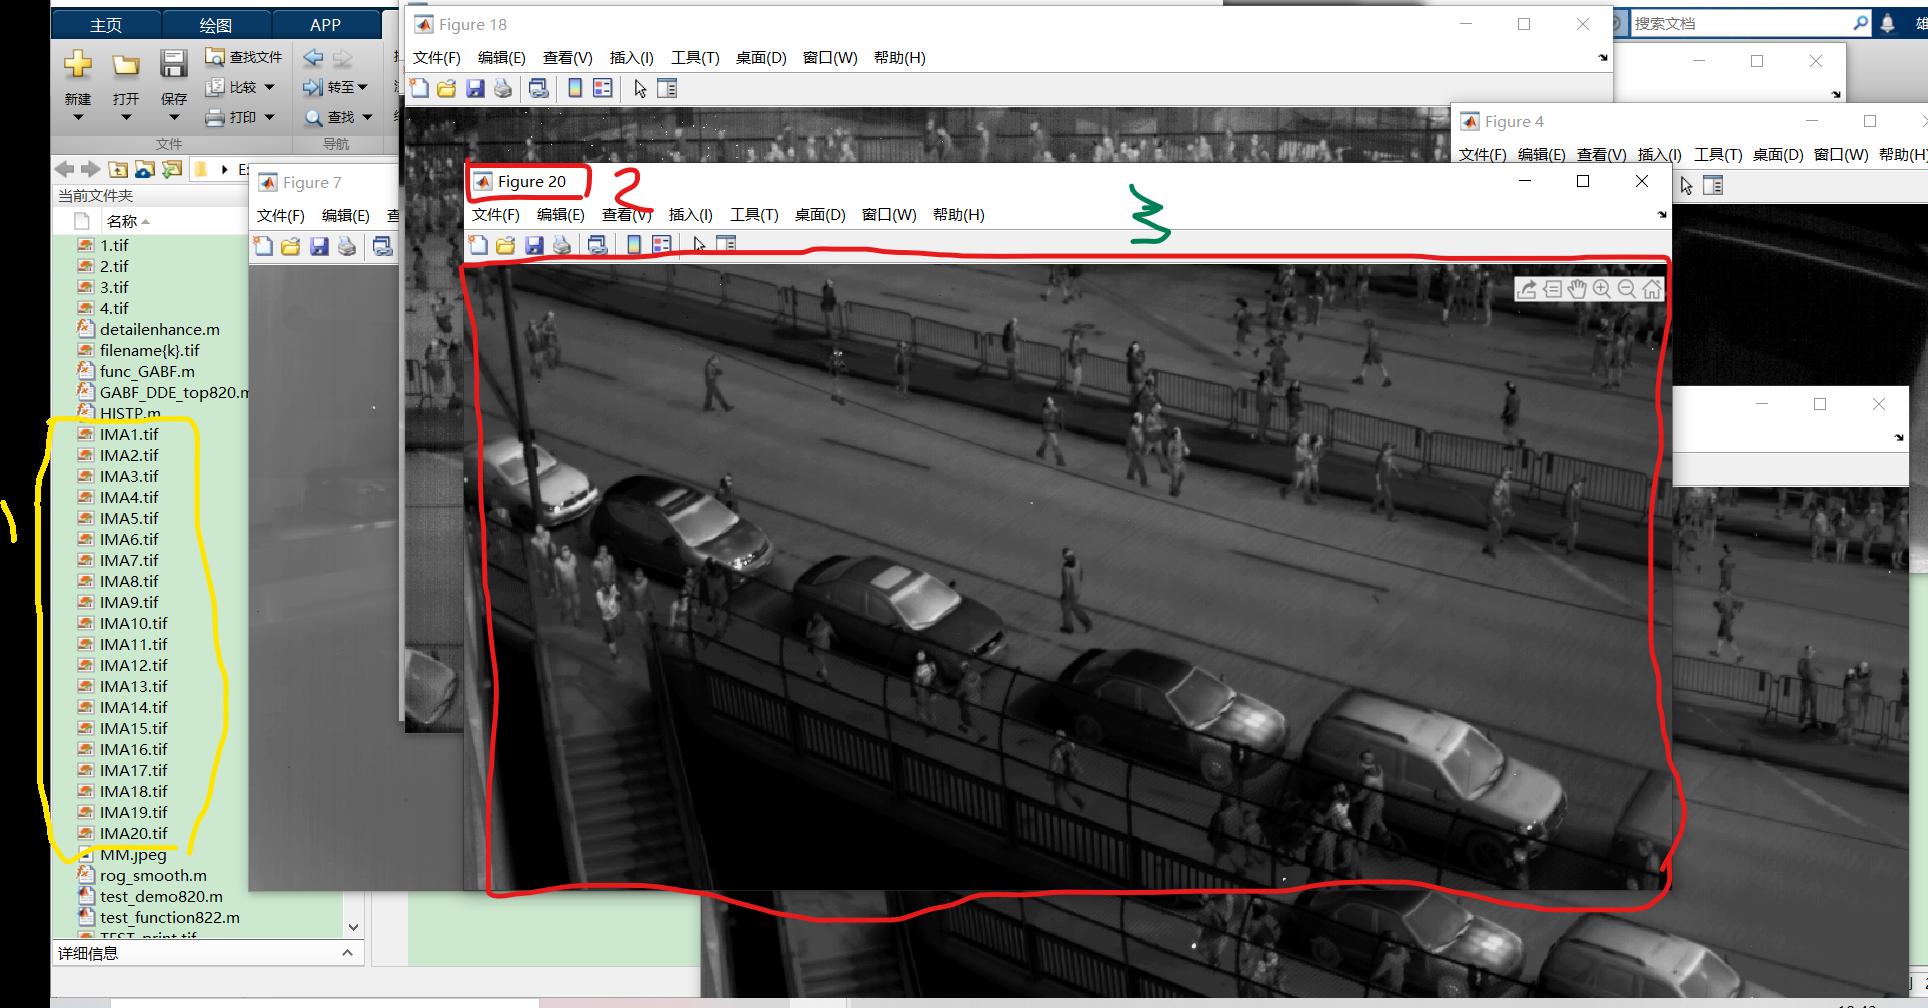 MATLAB批量存储图像和显示算法处理的图像不留空白插图